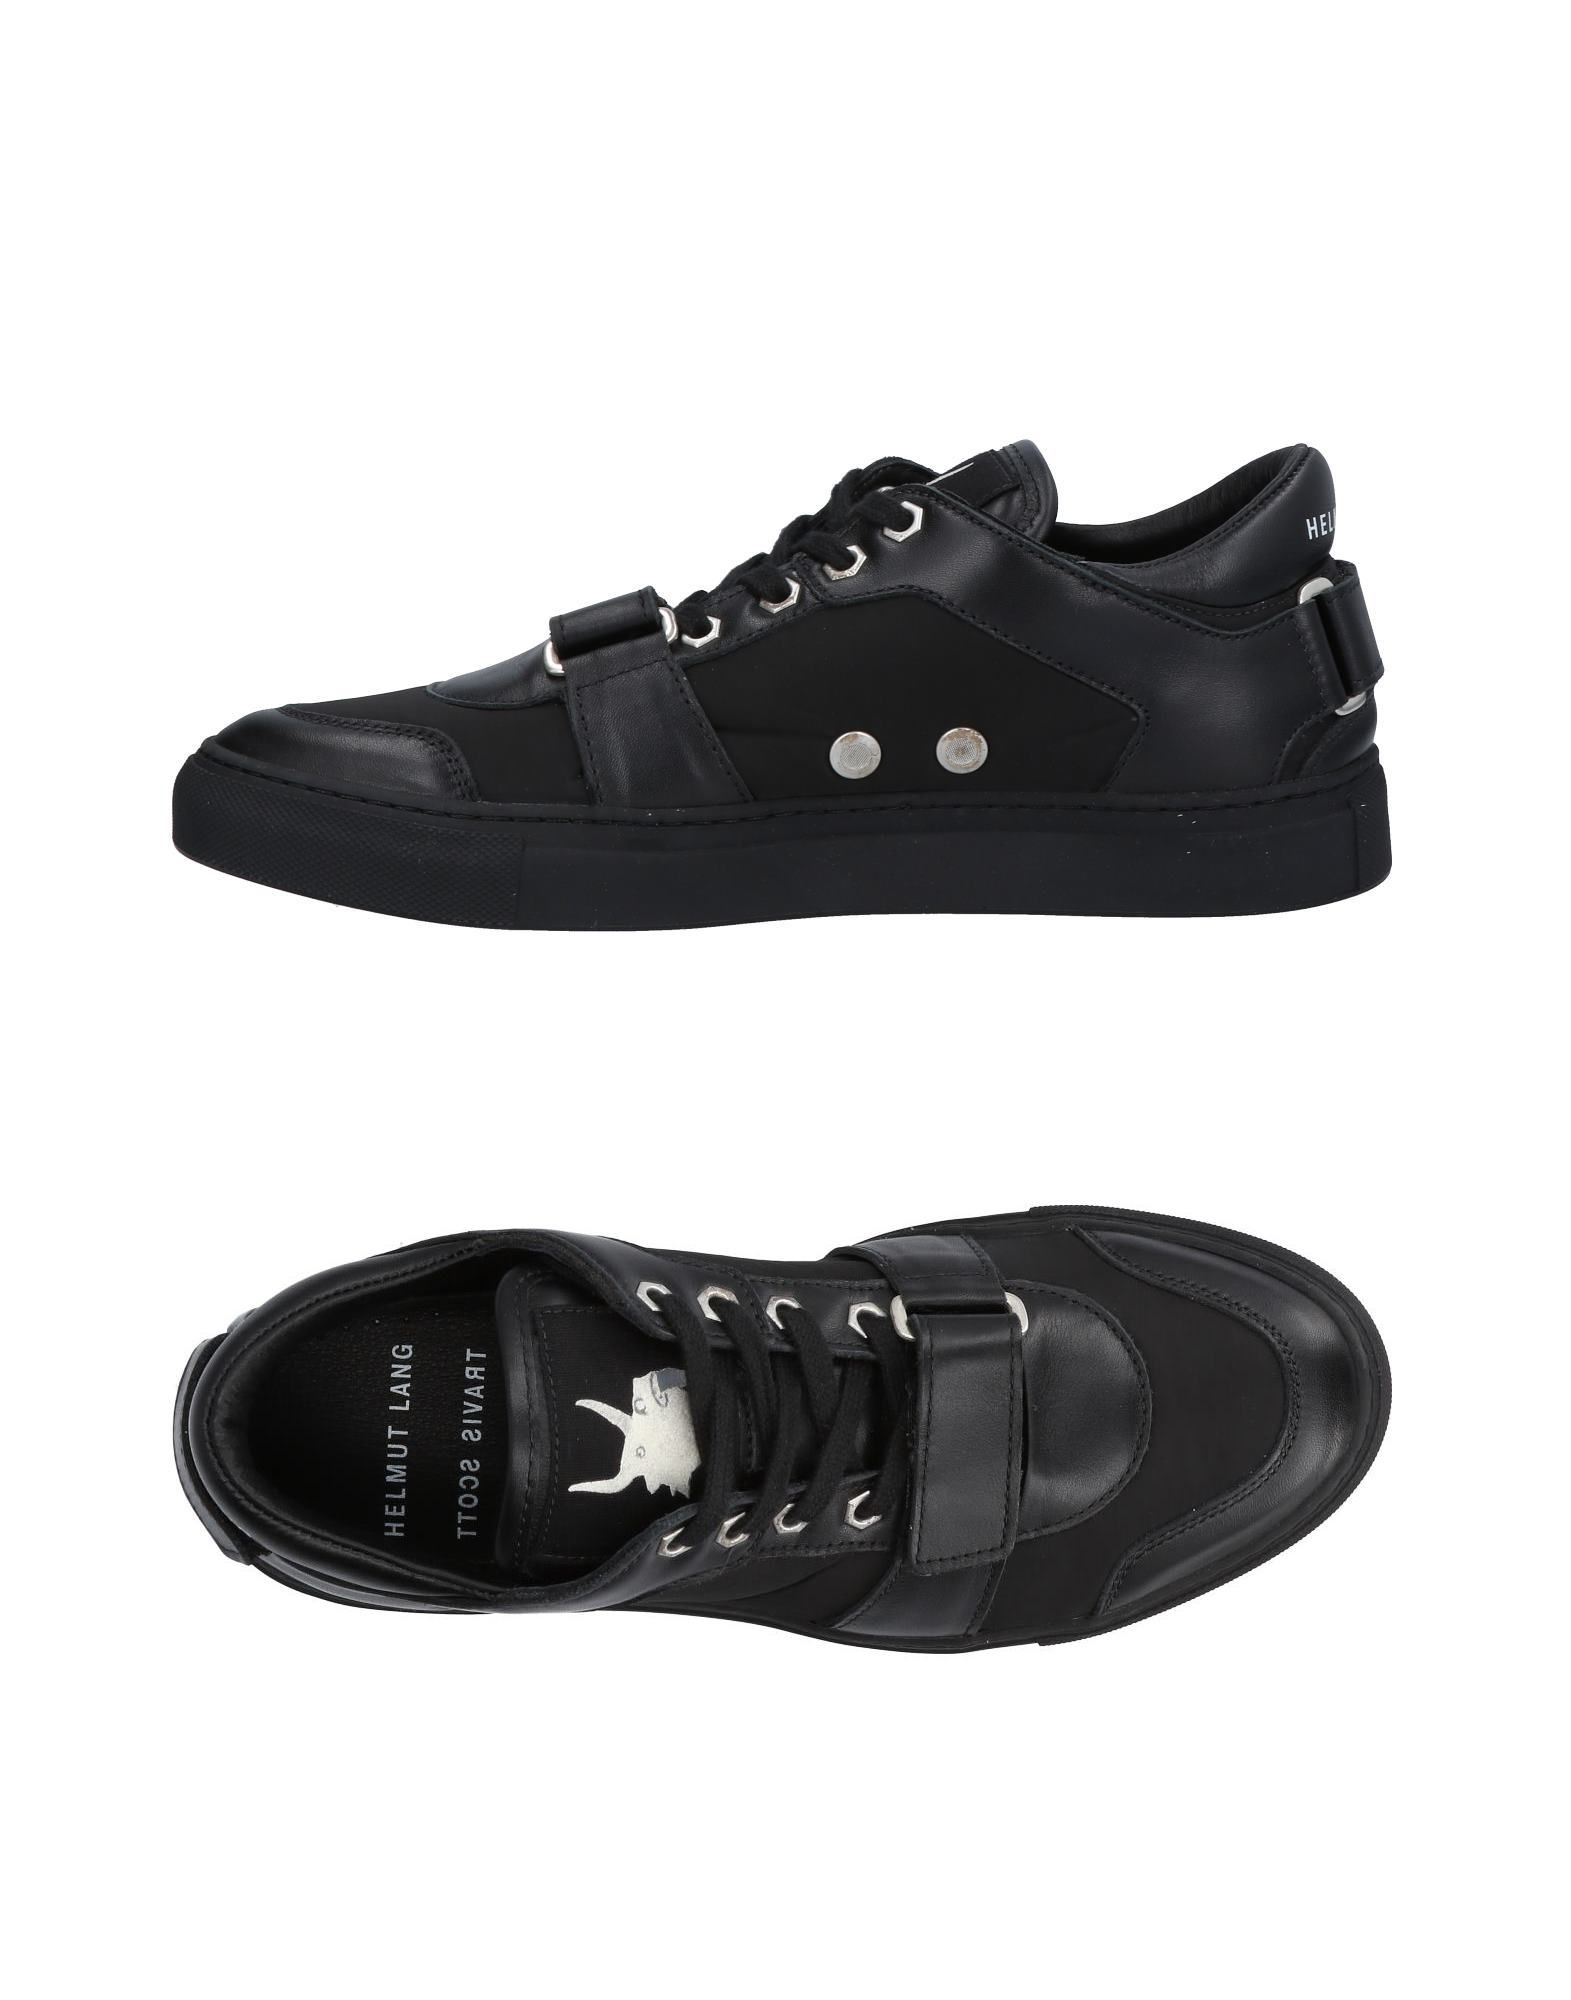 Helmut Lang Sneakers Herren  11459202QX Gute Qualität beliebte Schuhe